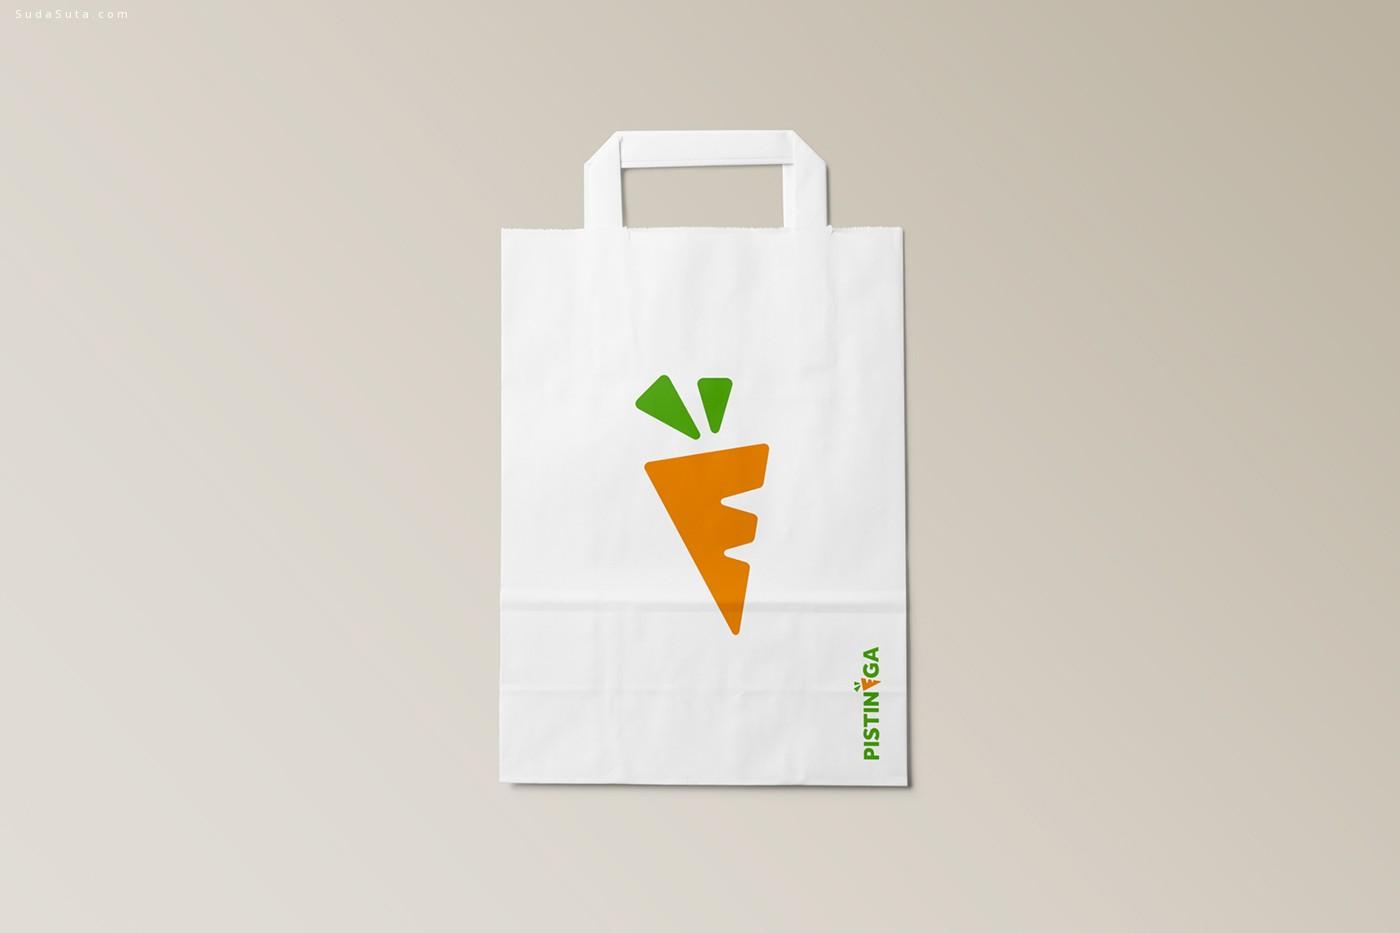 Pistinèga 胡萝卜的品牌设计欣赏